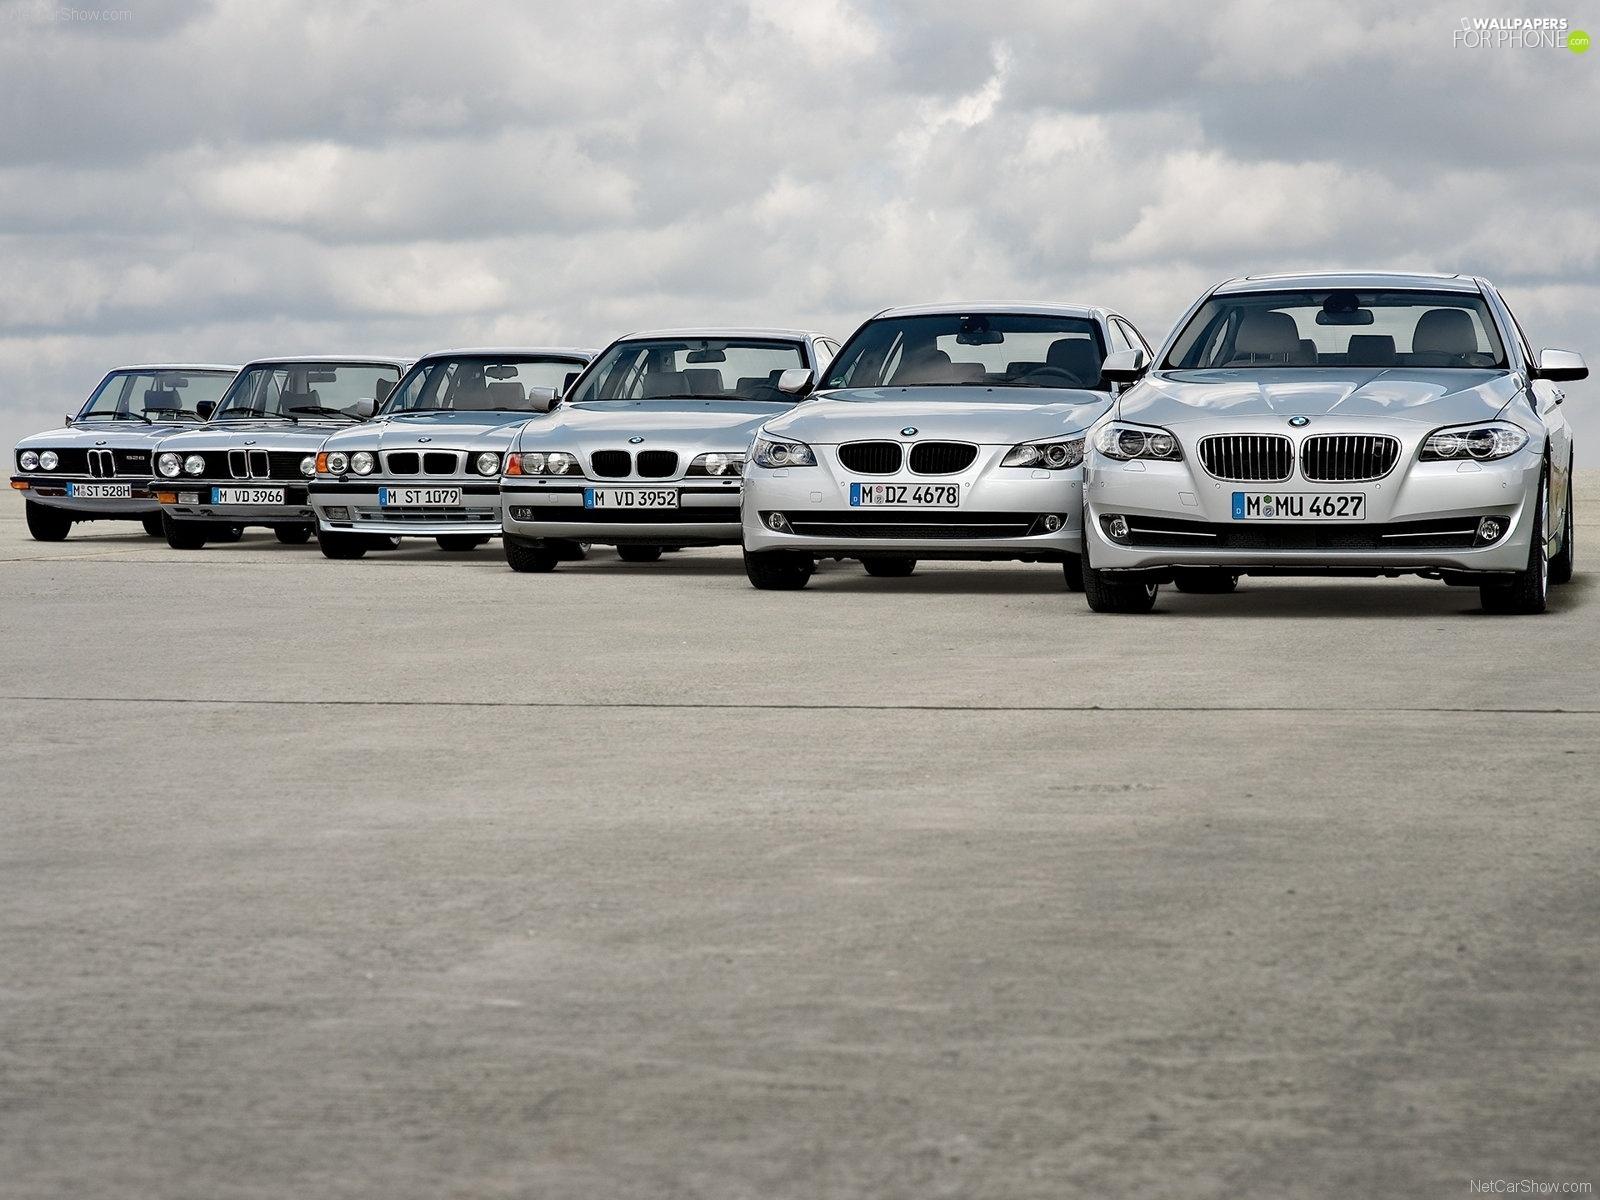 BMW F10, E39, E34, E60 - For phone wallpapers: 1600x1200